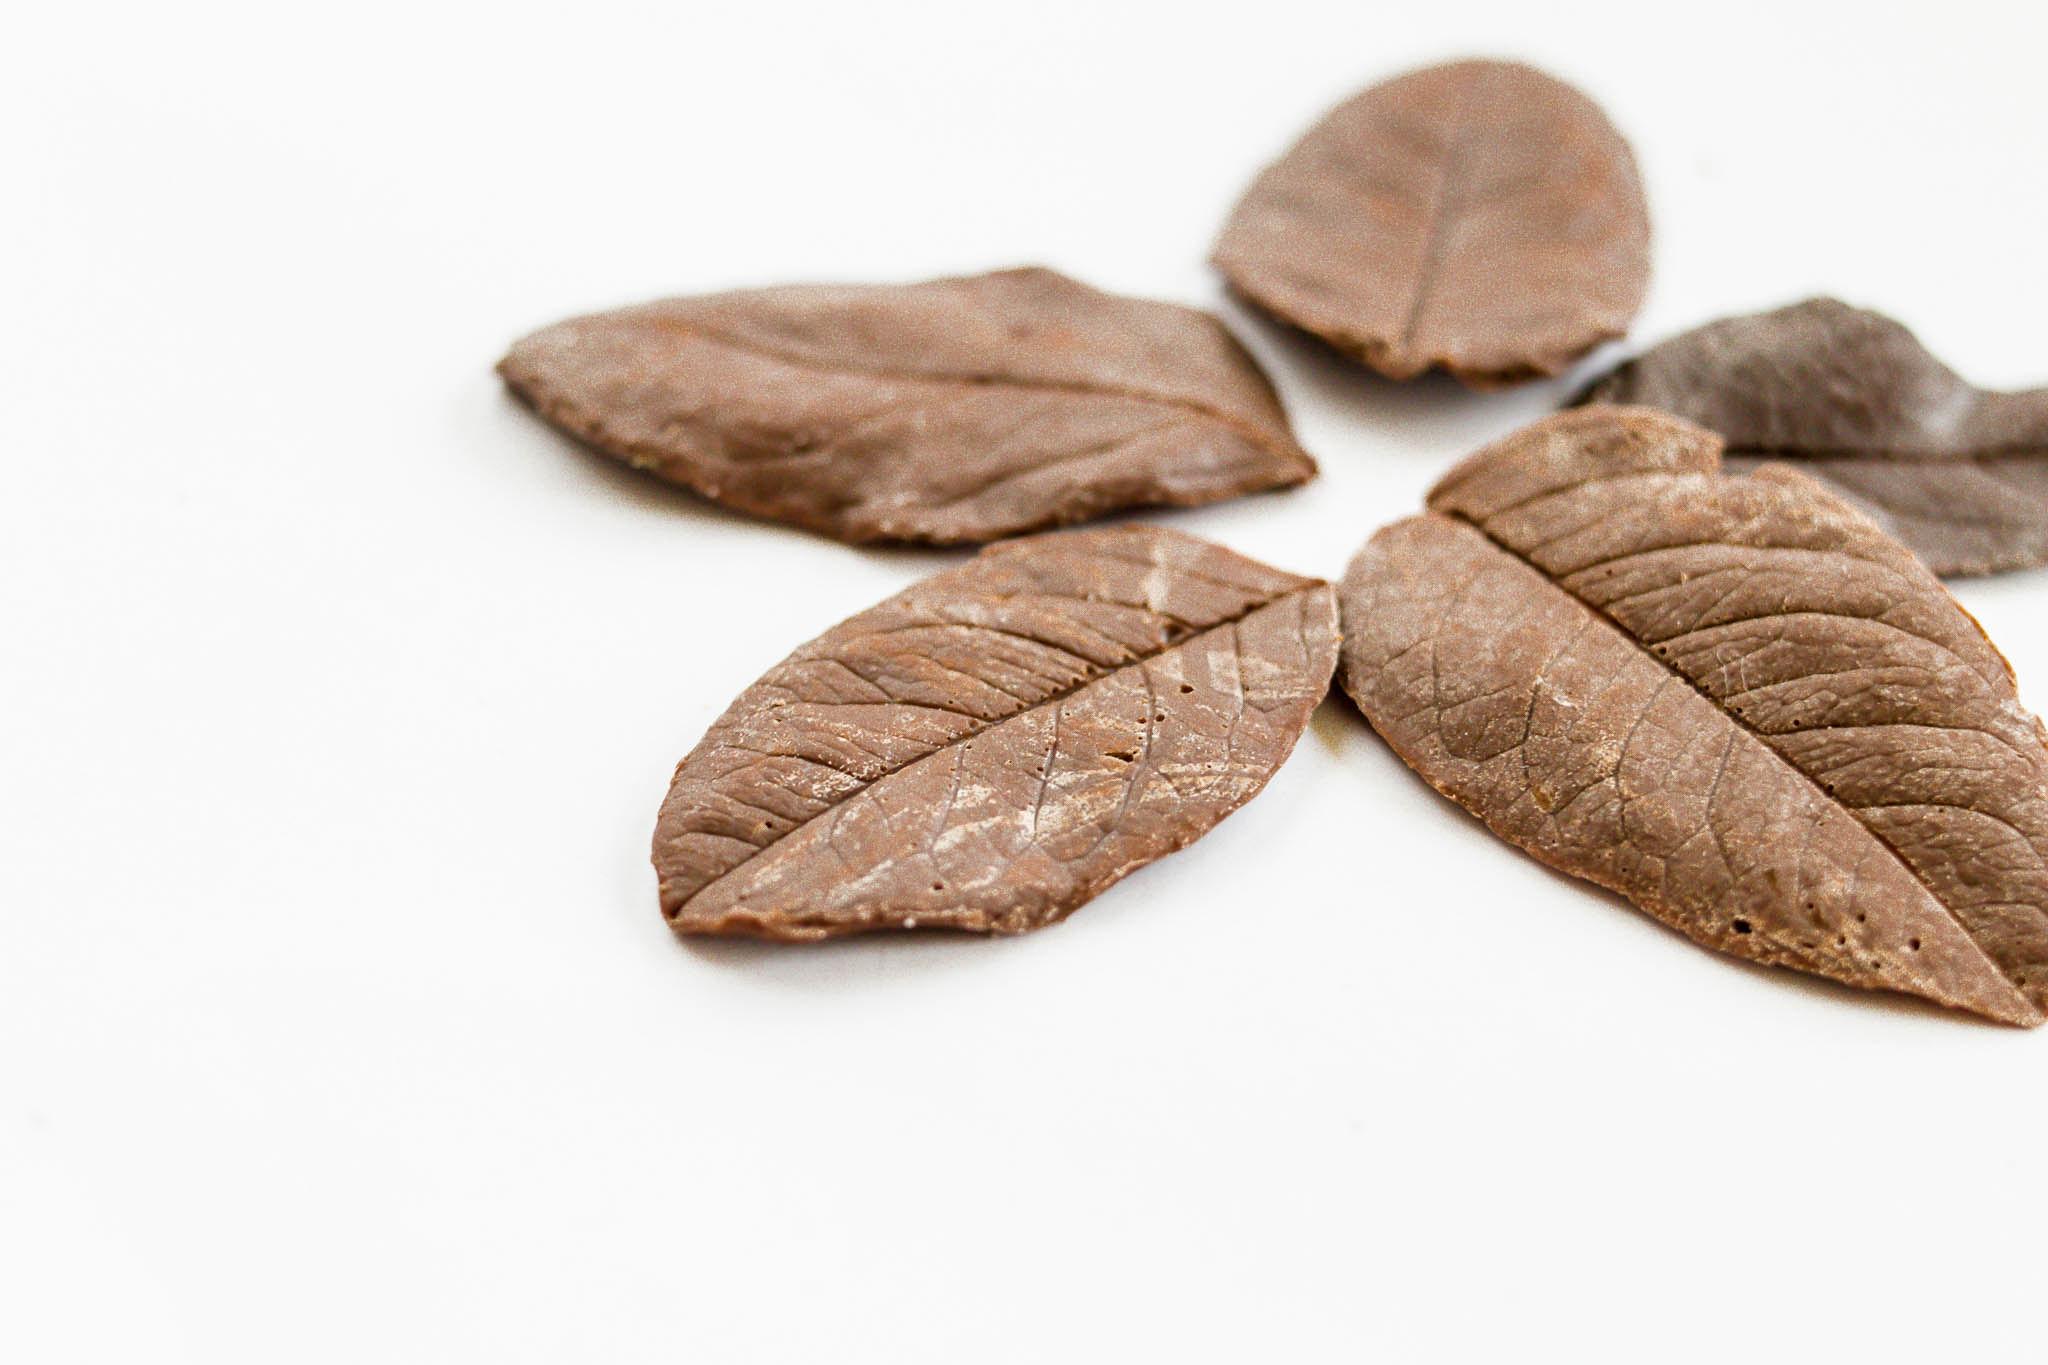 Homemade chocolate leaves